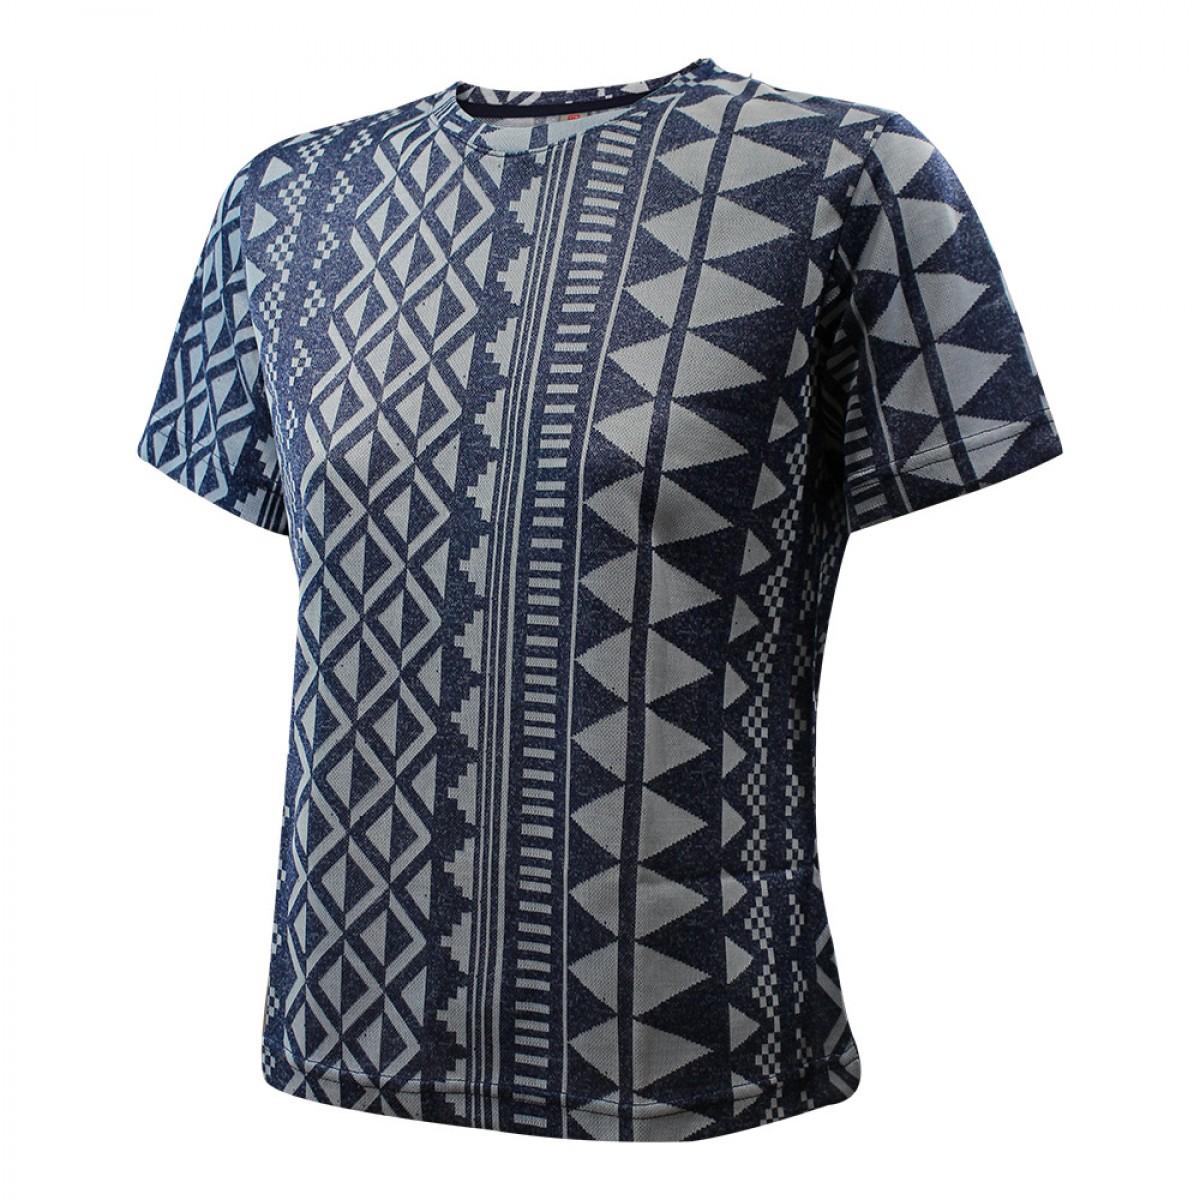 women-round-neck-t-shirt-krt06864-10a